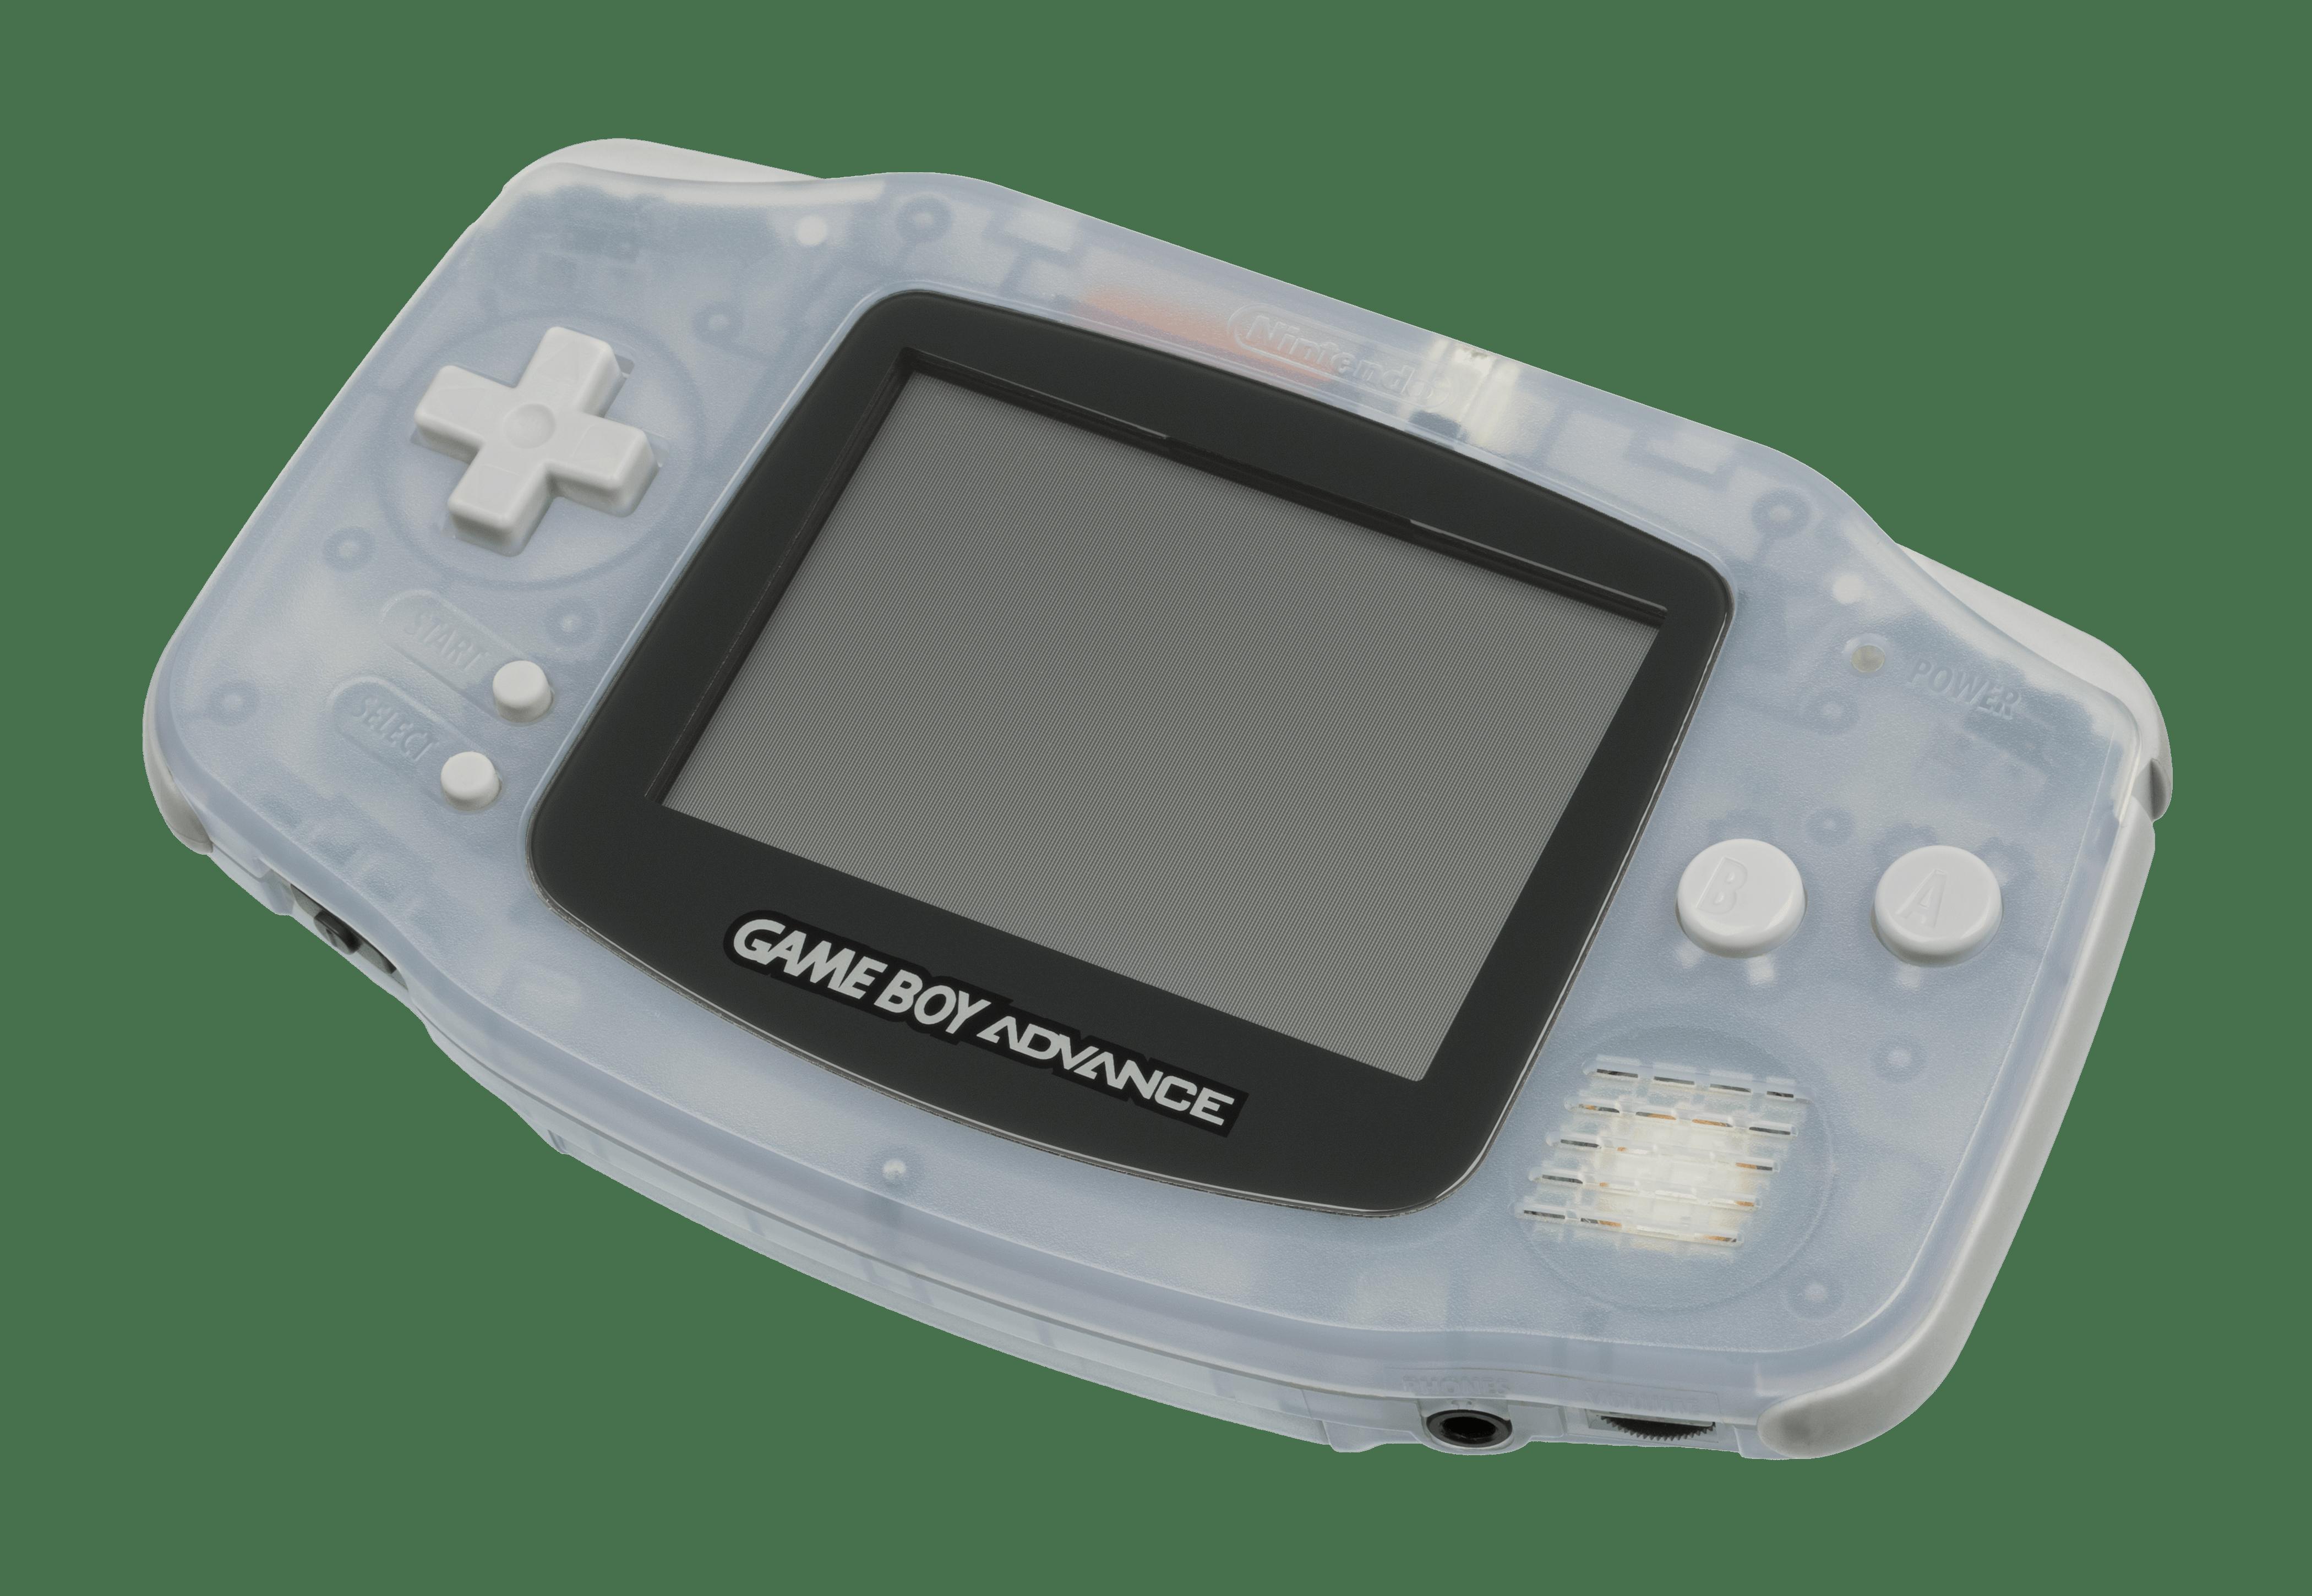 clipart transparent Nintendo game boy advance. Transparent gameboy.